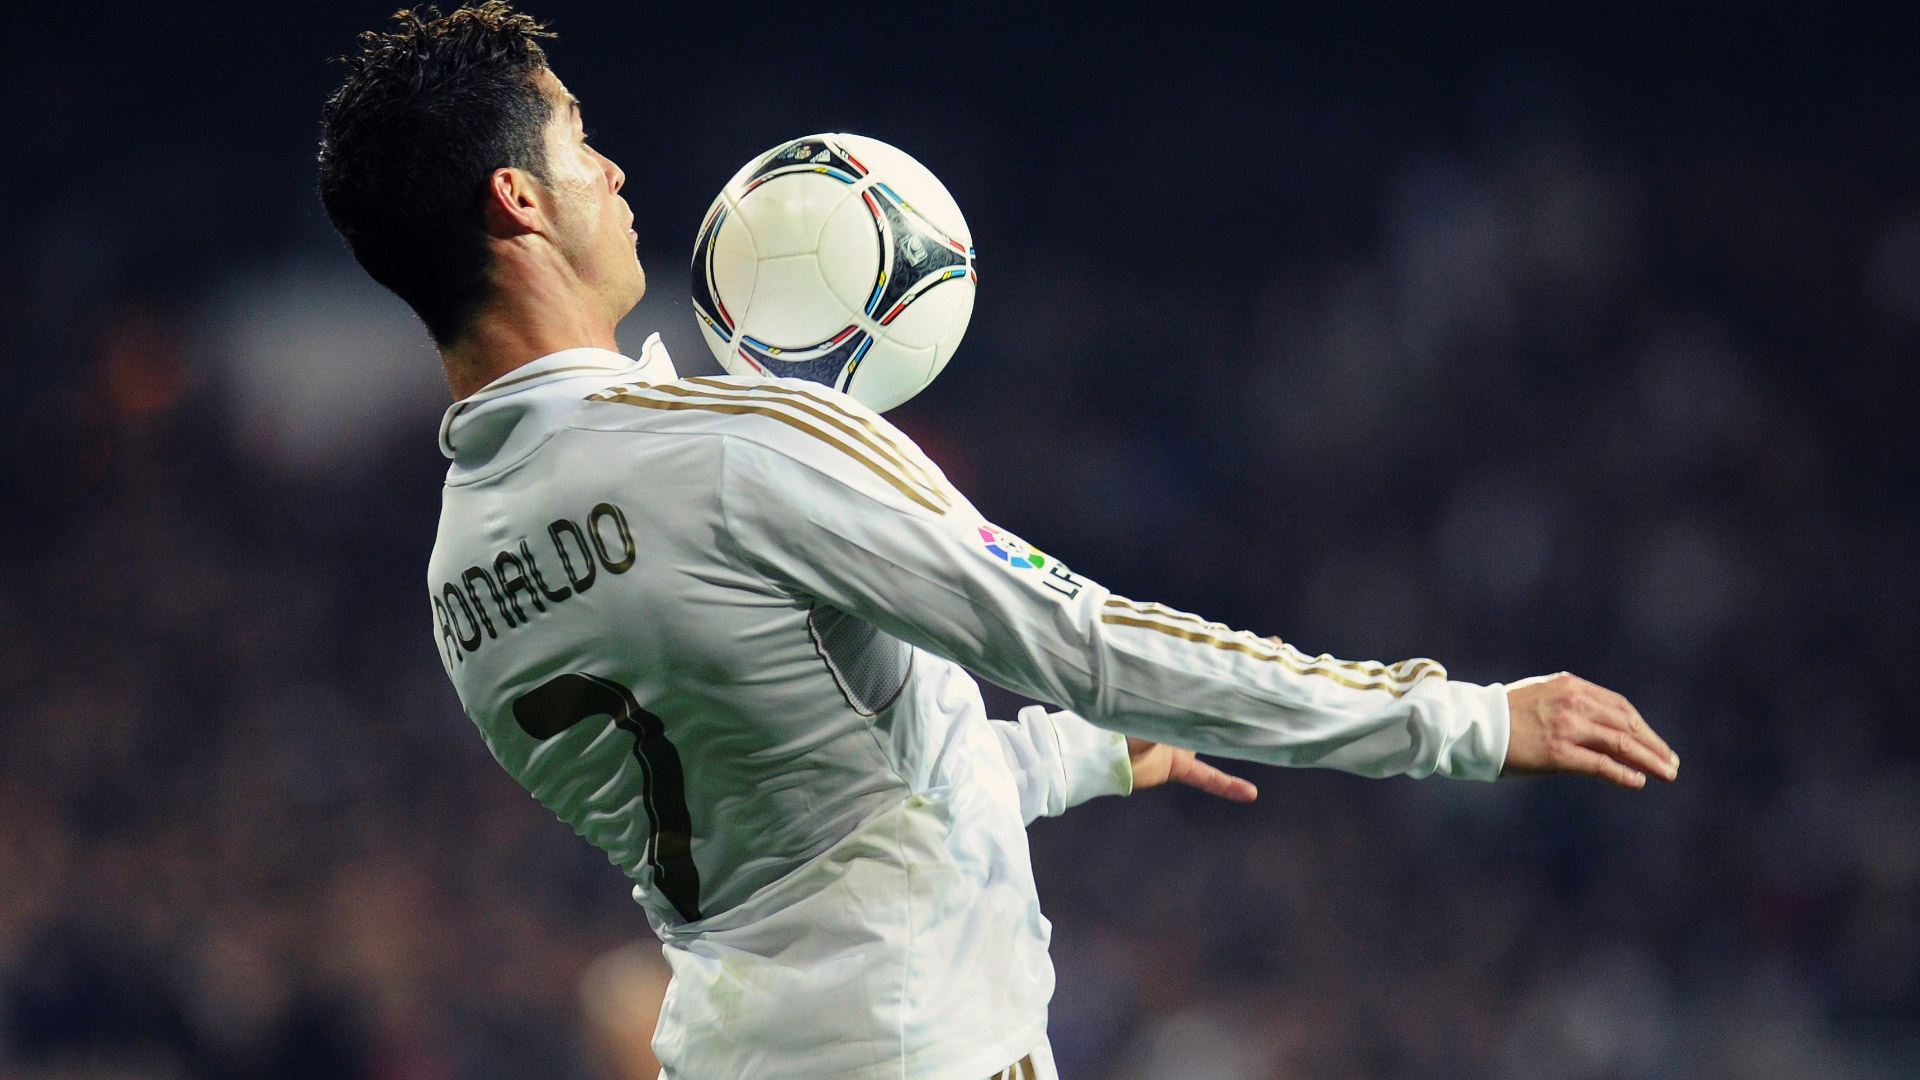 Fuentes de Informacin   Wallpapers Cristiano Ronaldo HD 1920x1080